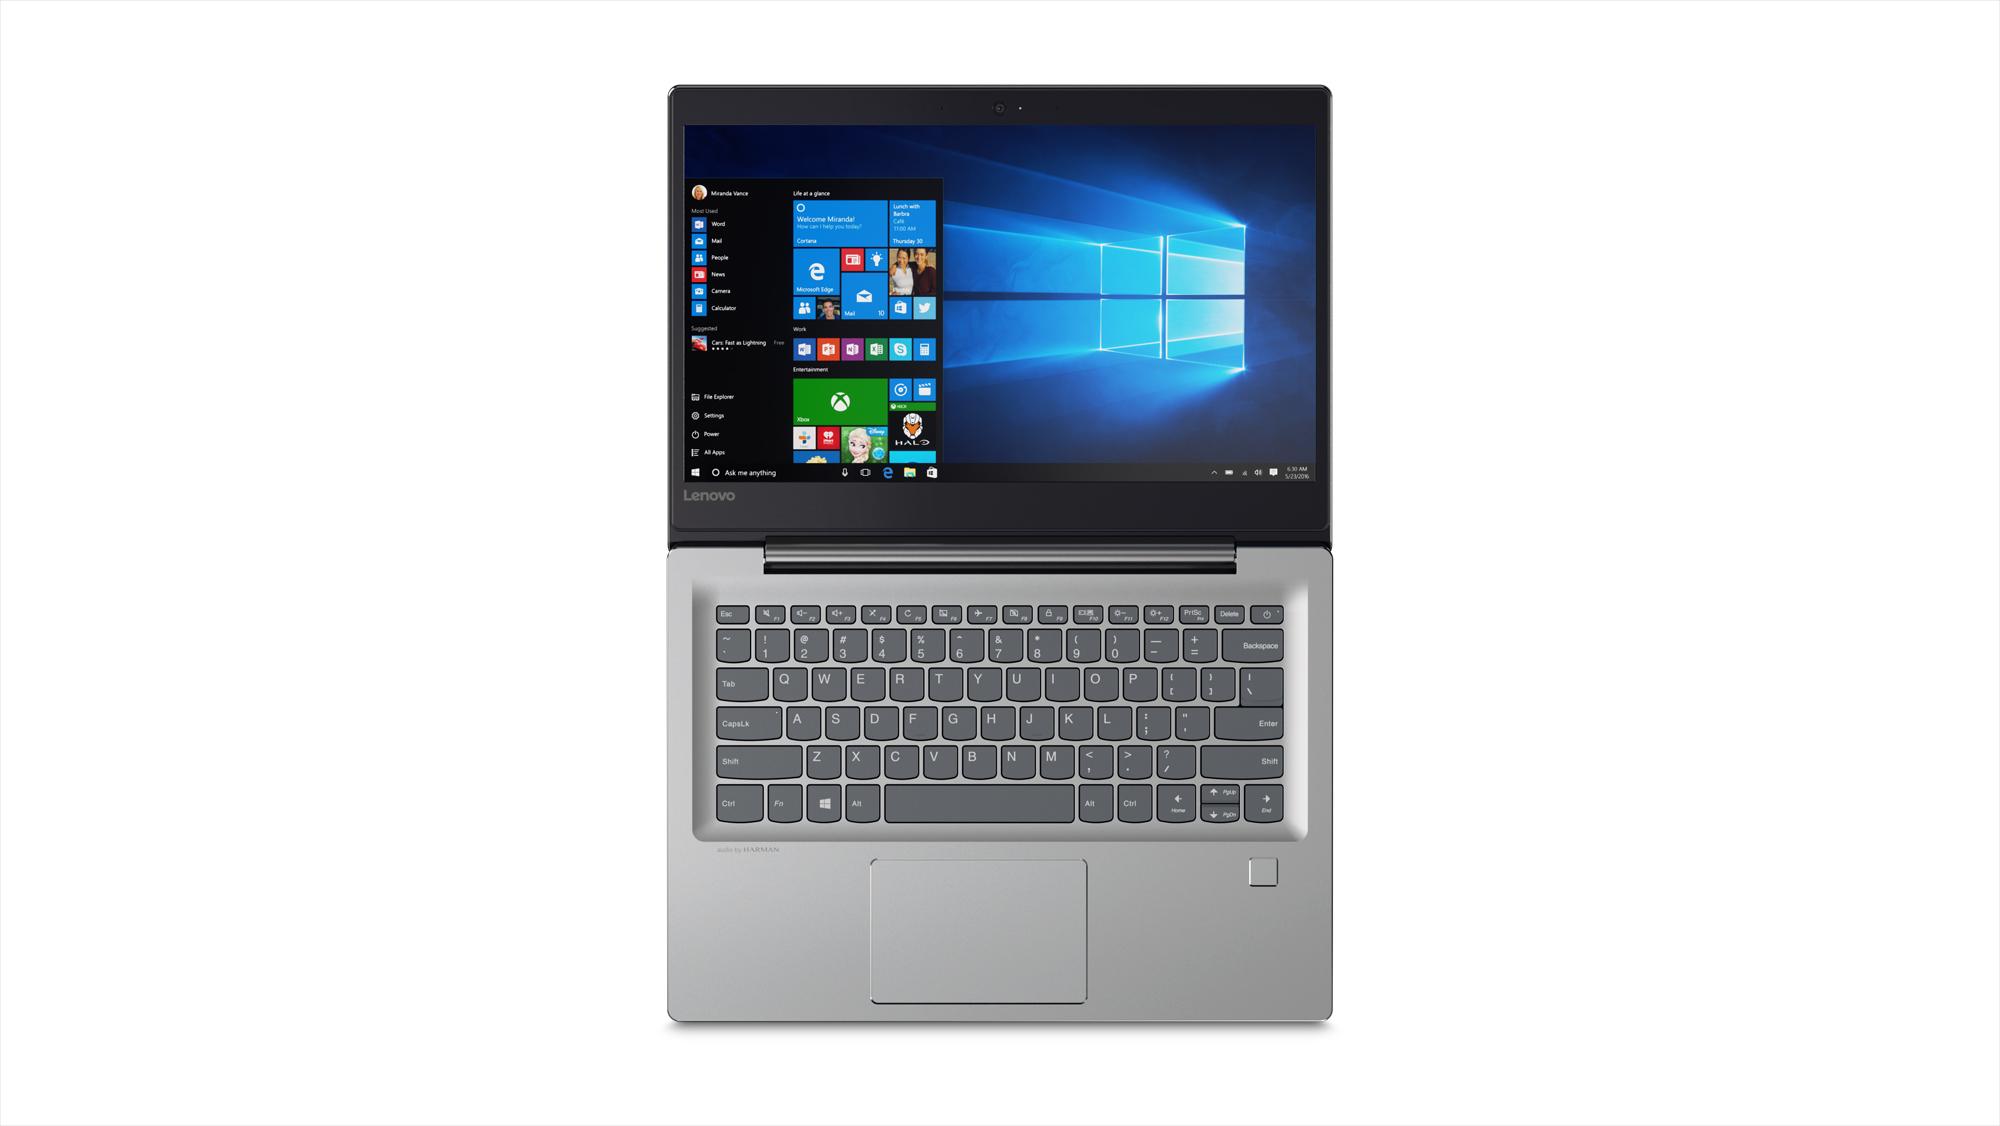 Lenovo ideapad 520S Laptop: 14'' FHD IPS, i5-8250U, 8GB DDR4, 1TB HDD, Win10H @ $550 with F/S